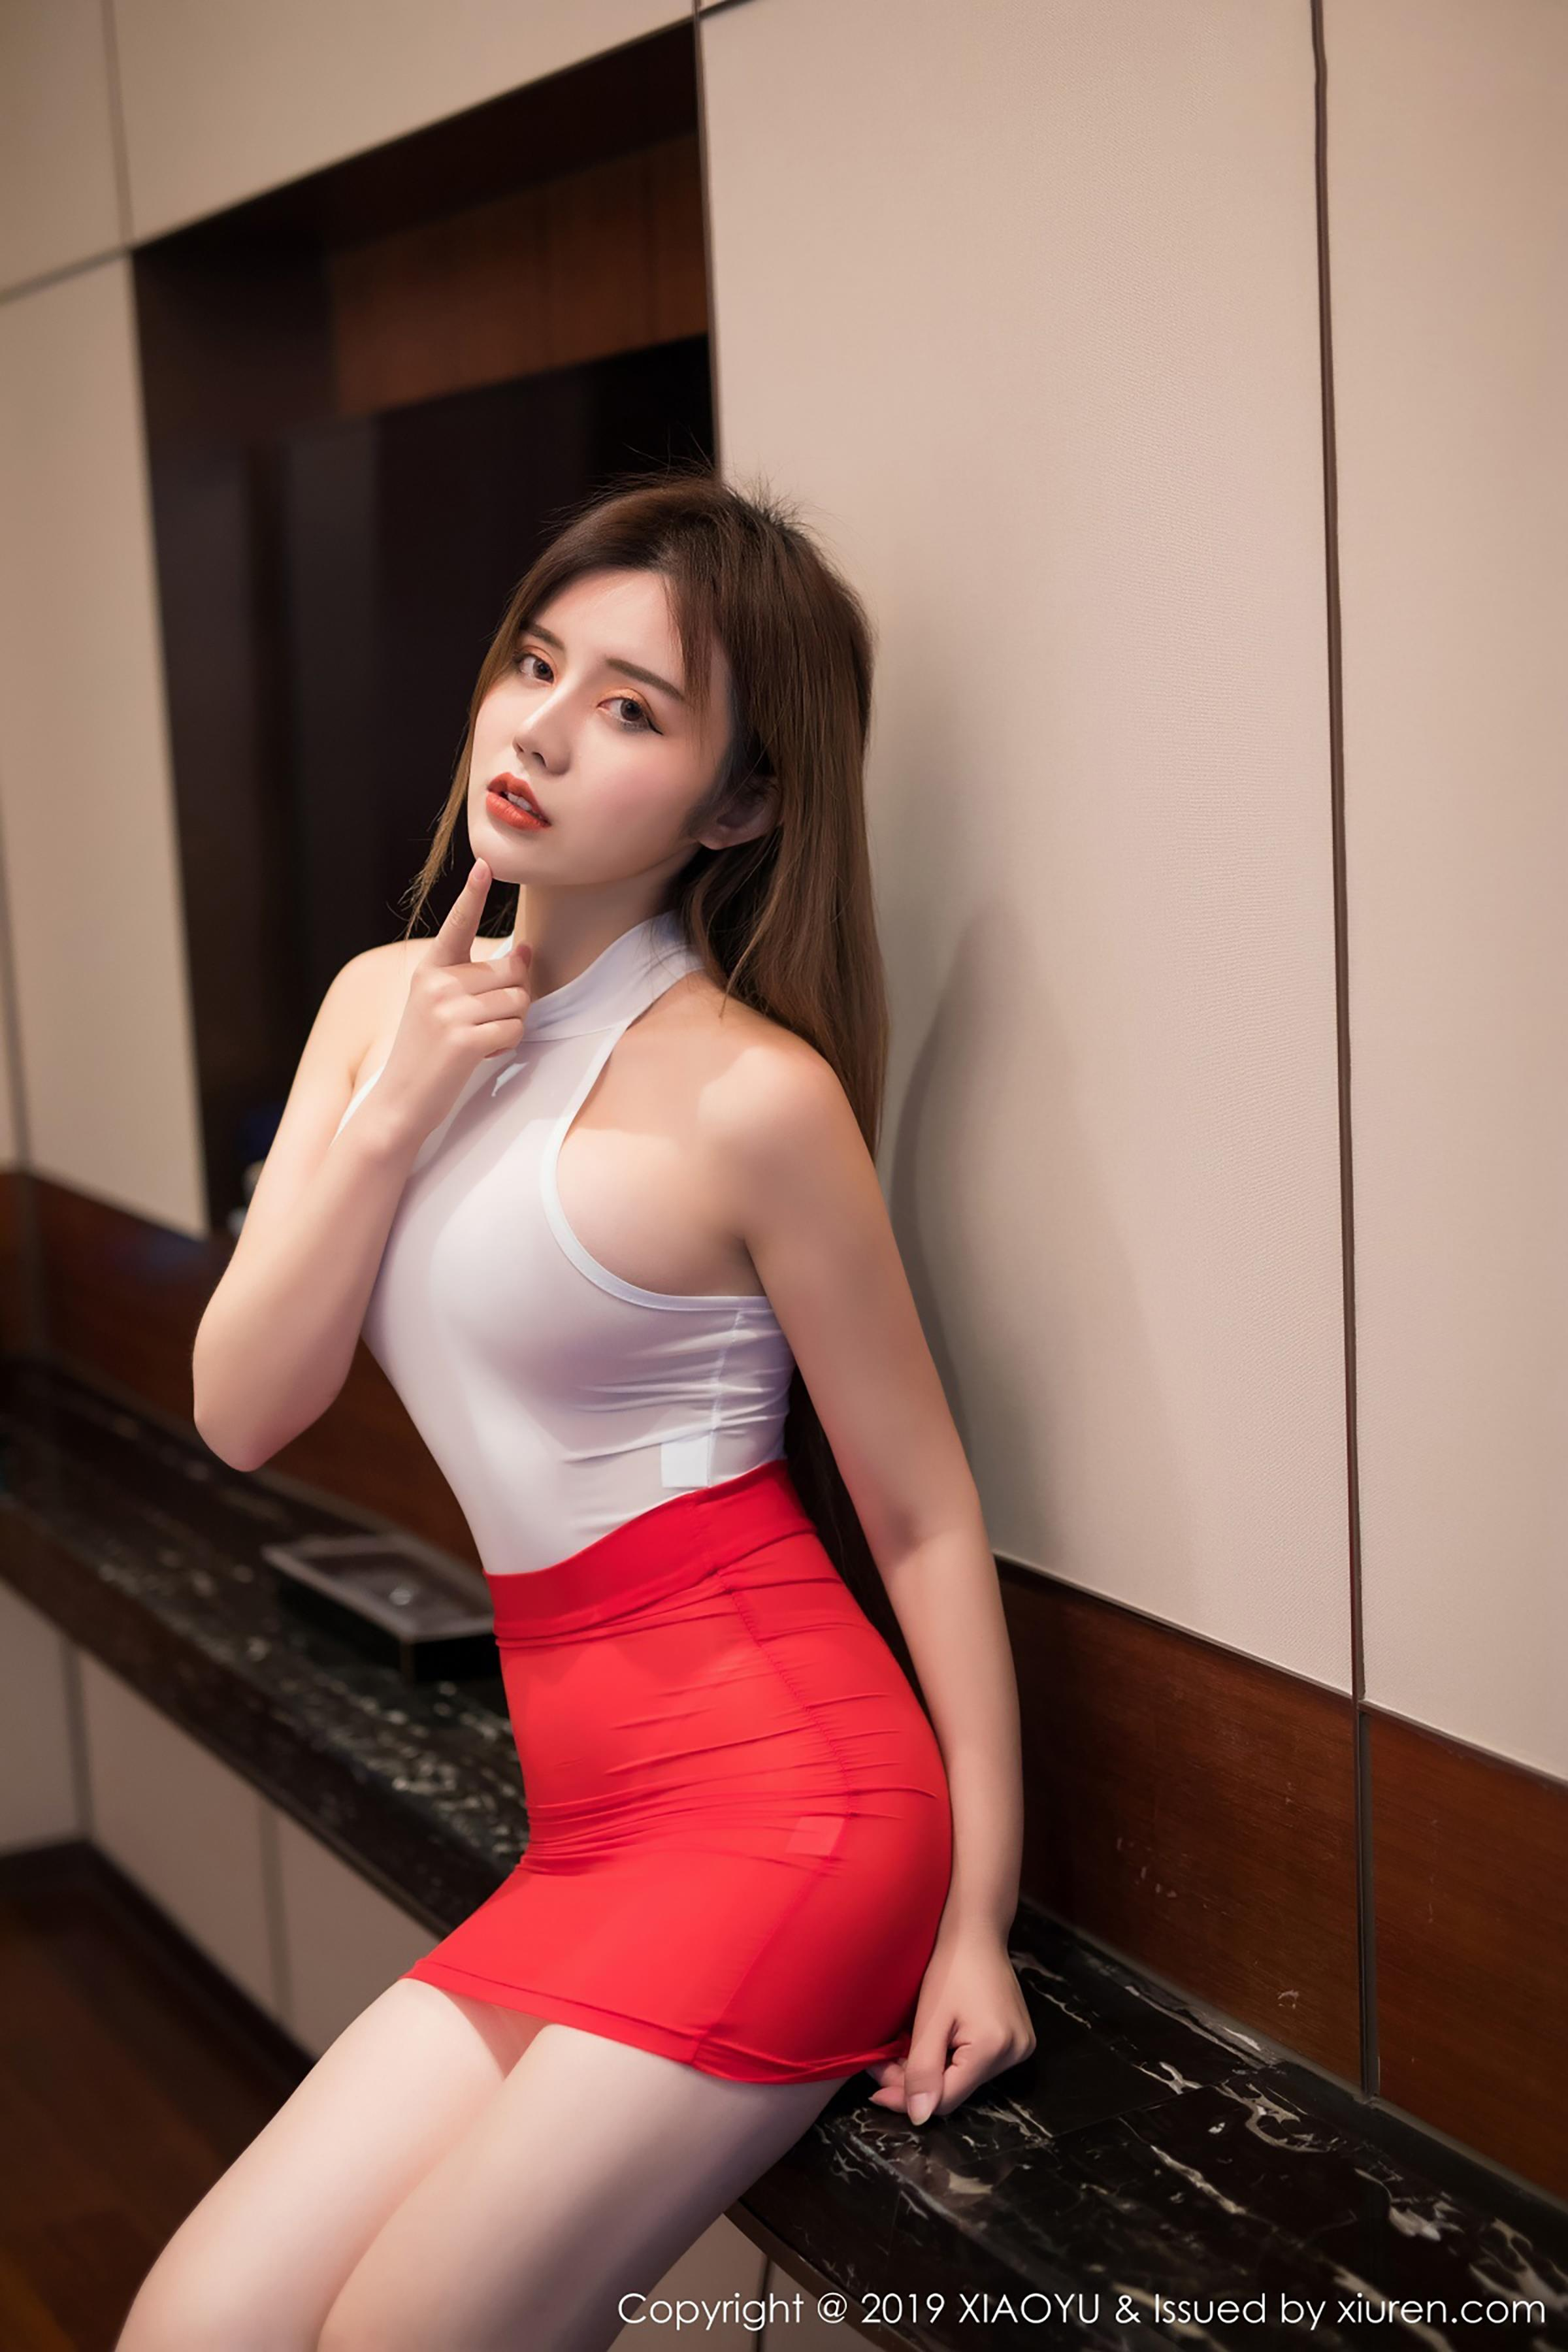 [XIAOYU画语界]YU20190327VOL0043 Cris_卓娅祺 白色紧身连体衣加红色短裙性感私房写真集